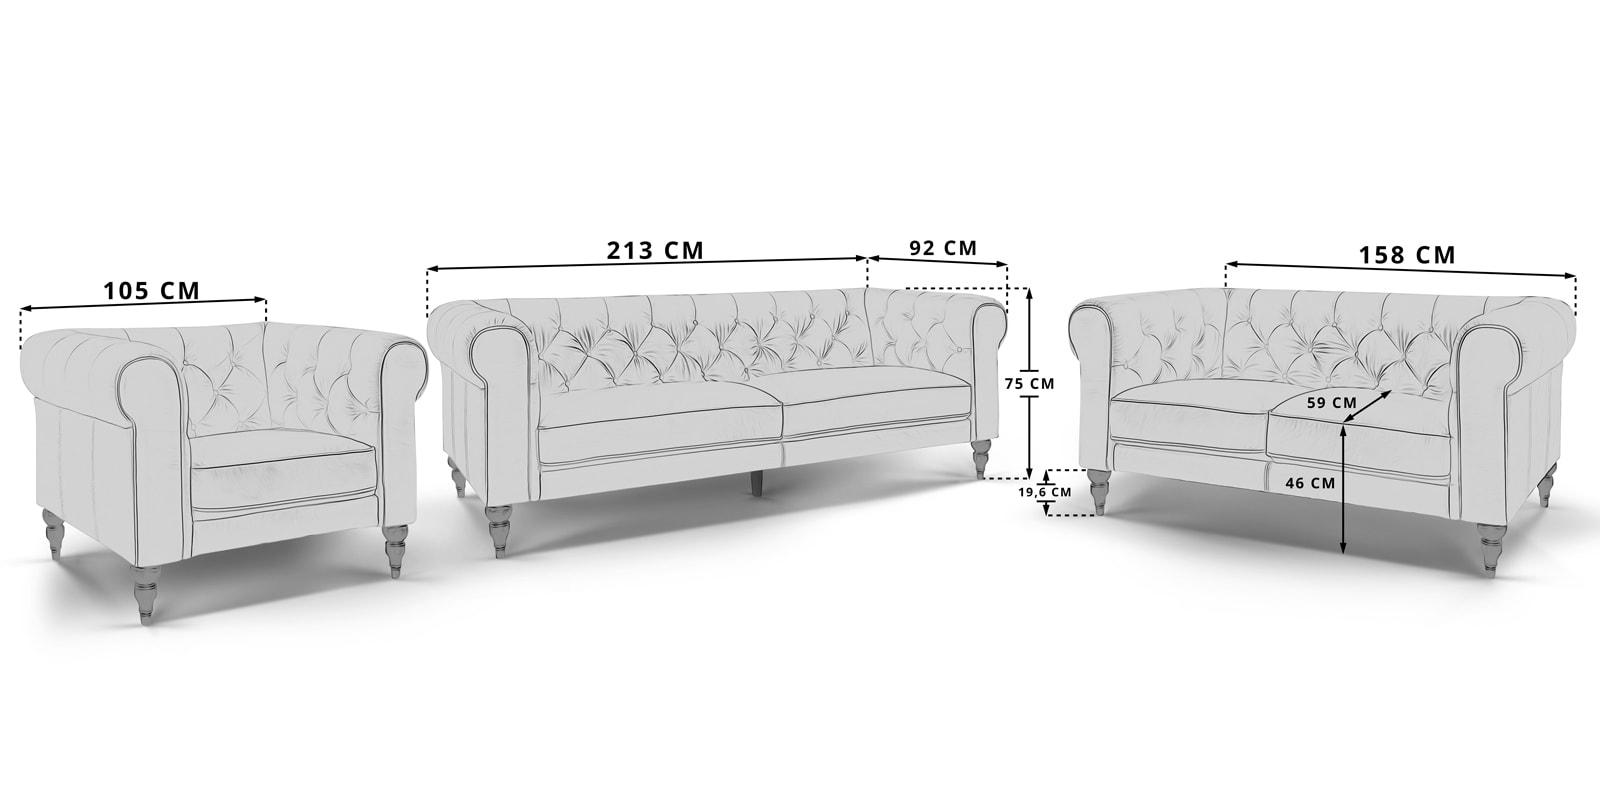 Moebella24 - 3-2-1-Sitzer - Sofa - Sessel - Chesterfield - Hudson - Skizze - Maße